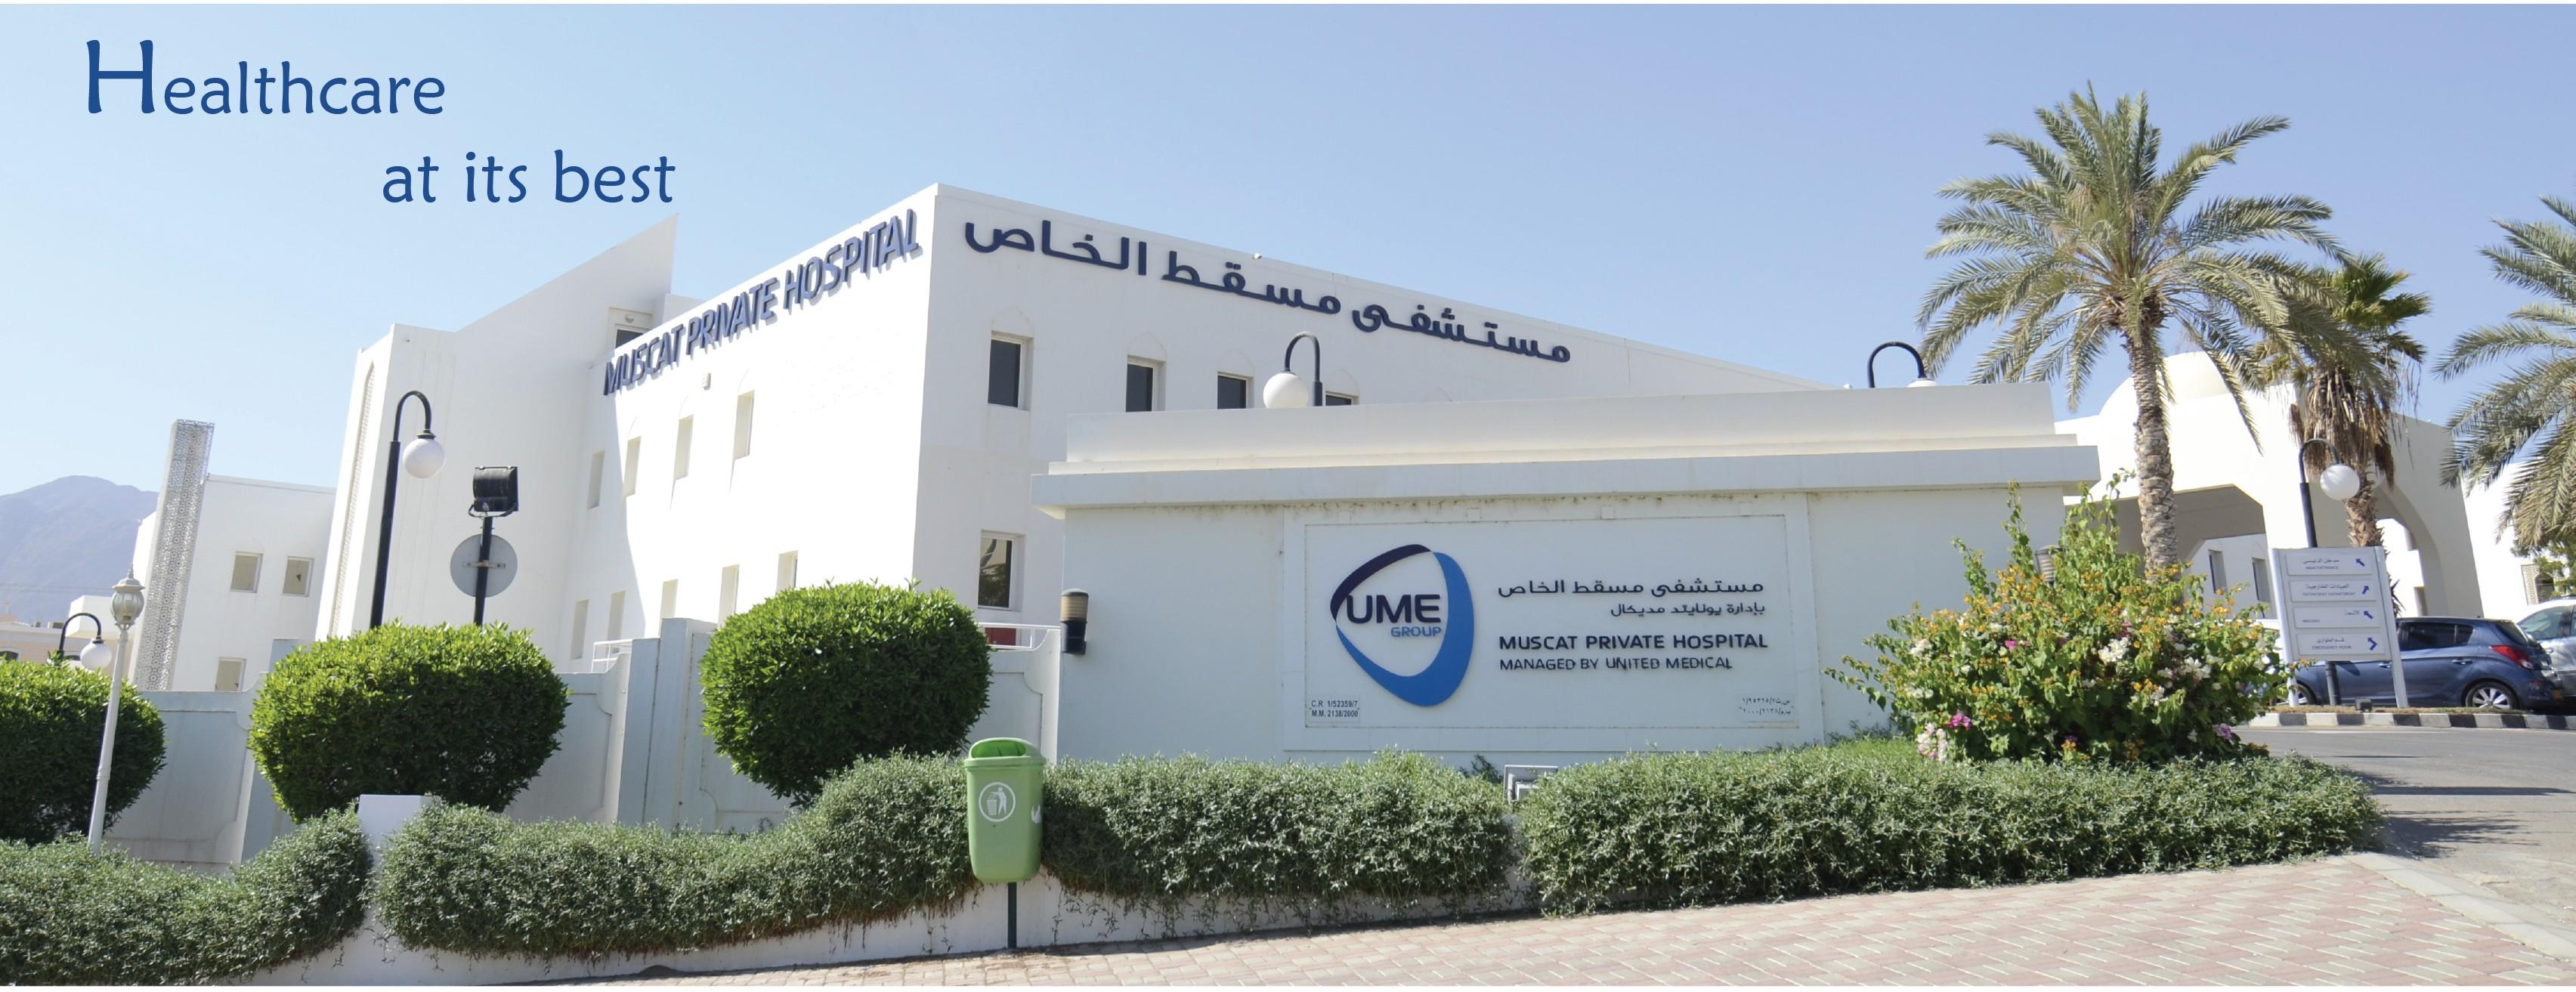 Muscat Private Hospital | LinkedIn